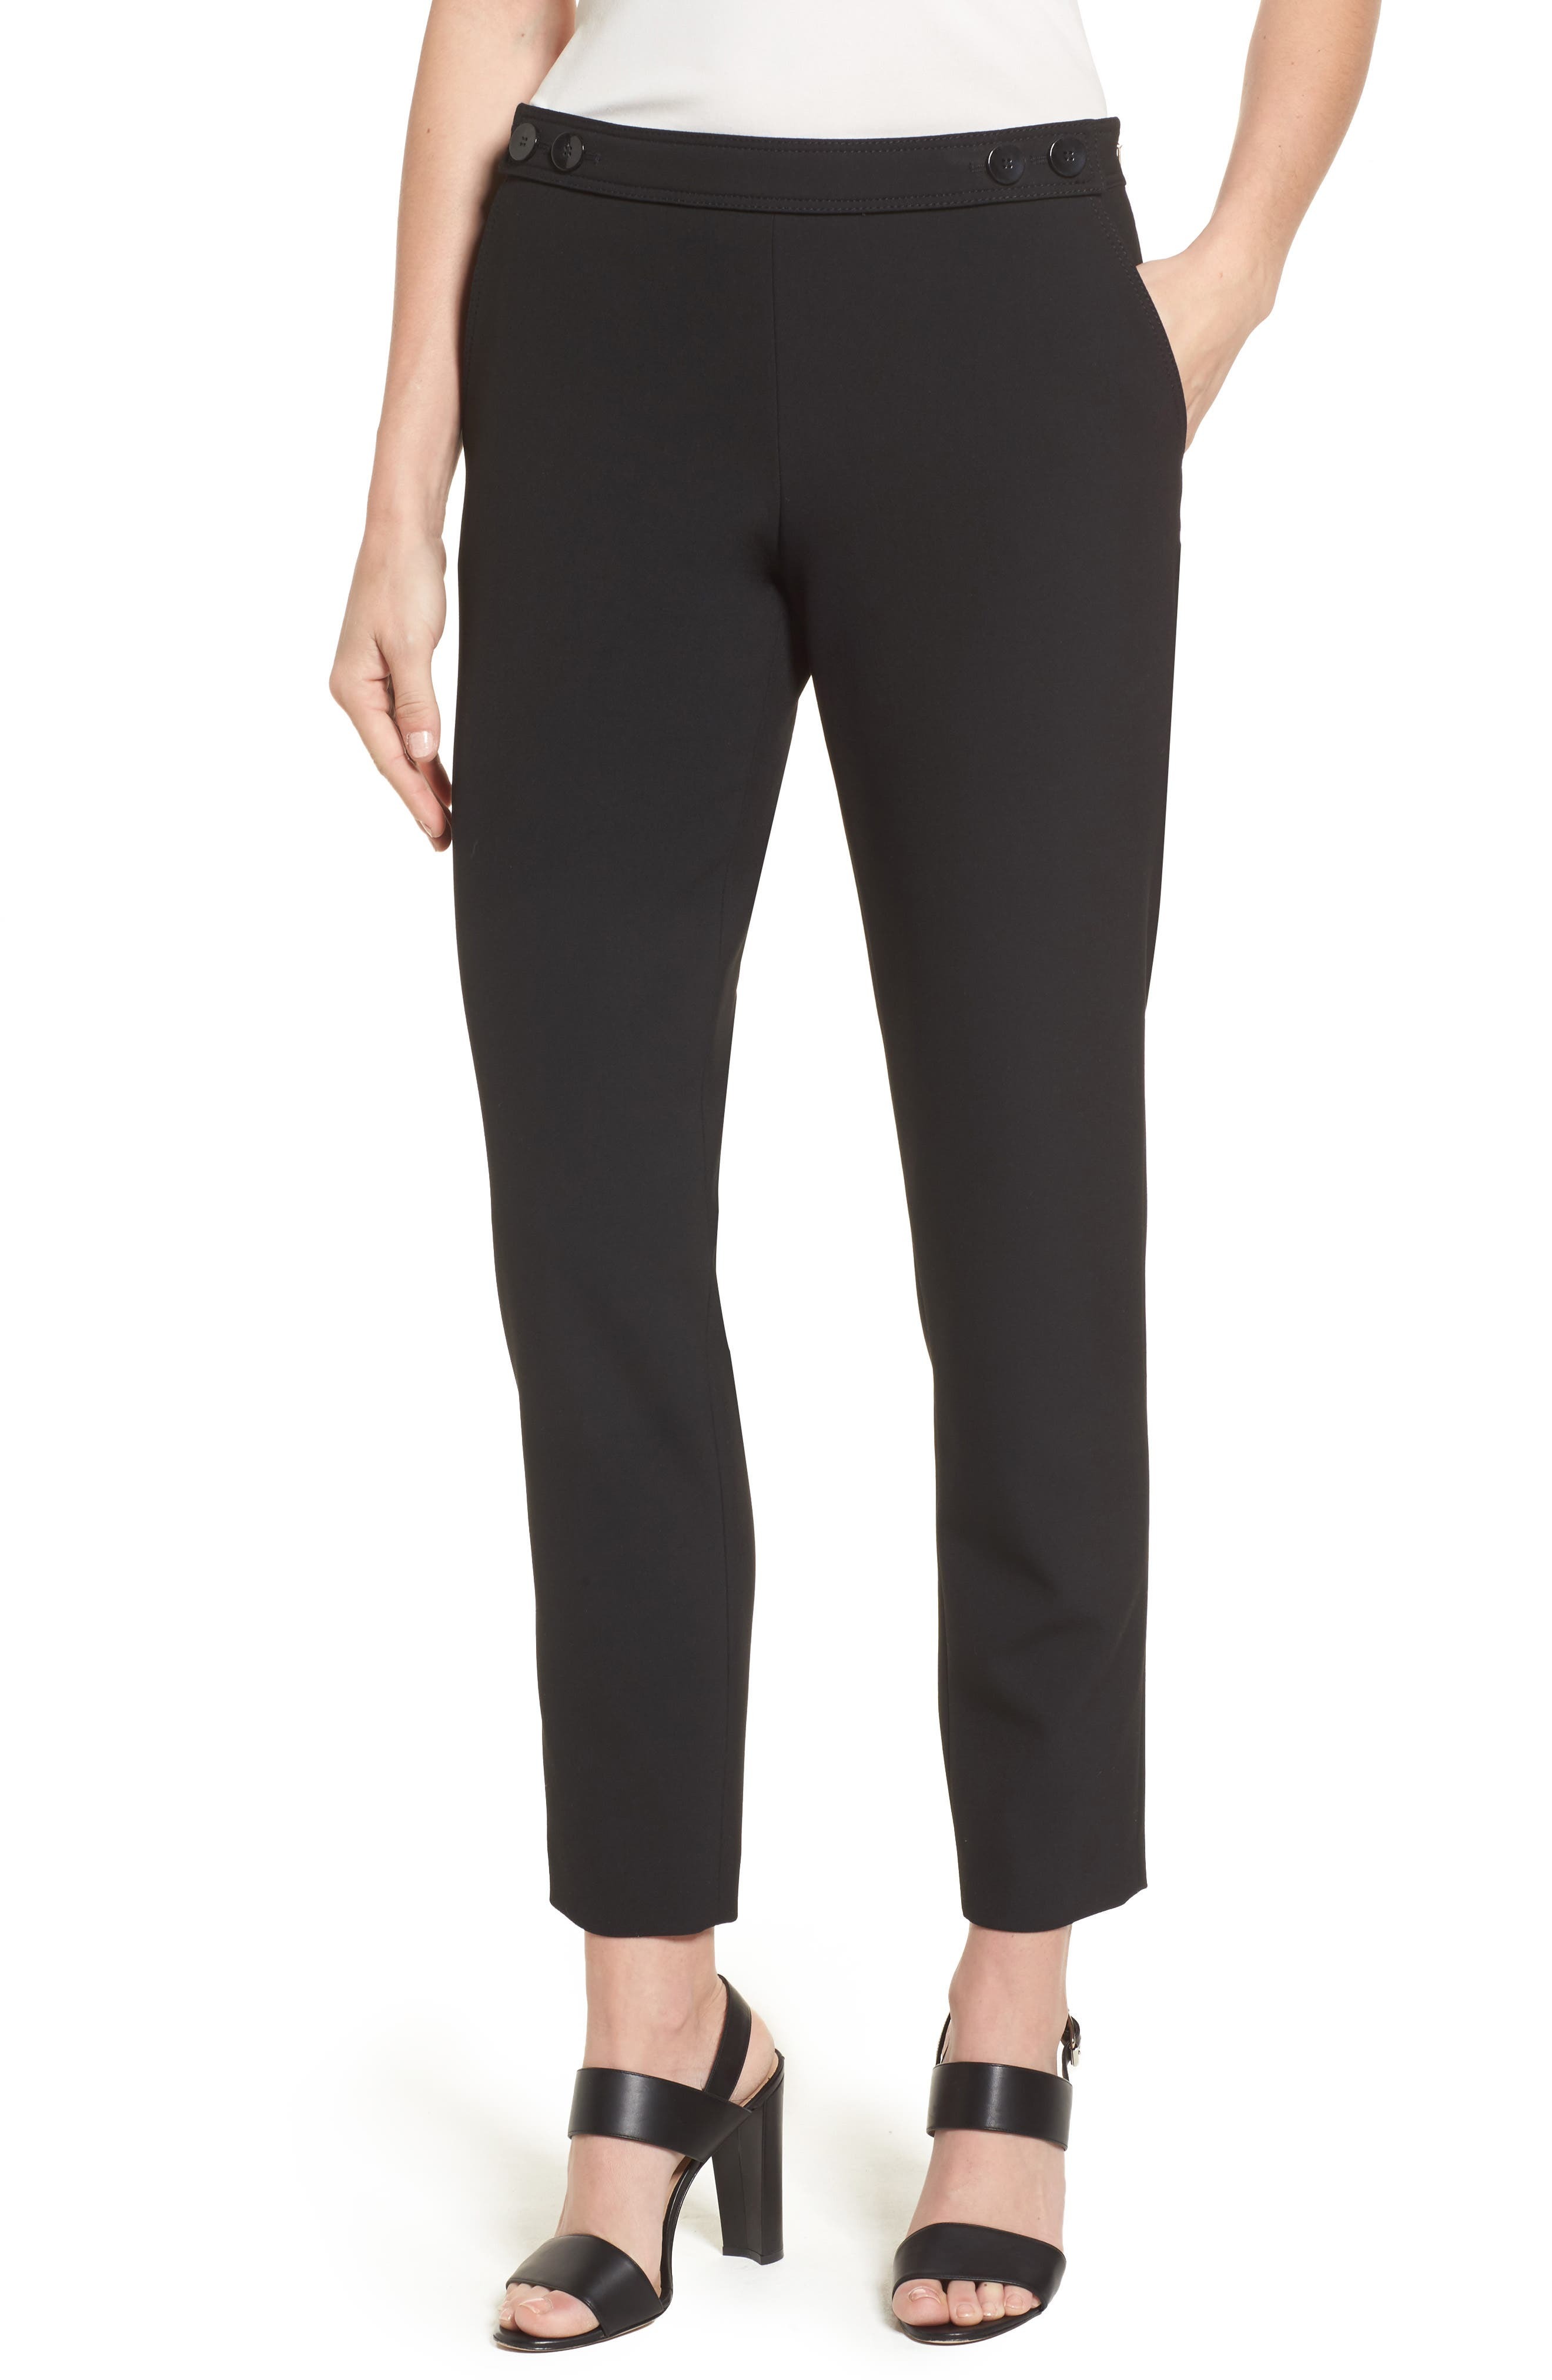 Tiokenia Slim Leg Trousers,                         Main,                         color, Black